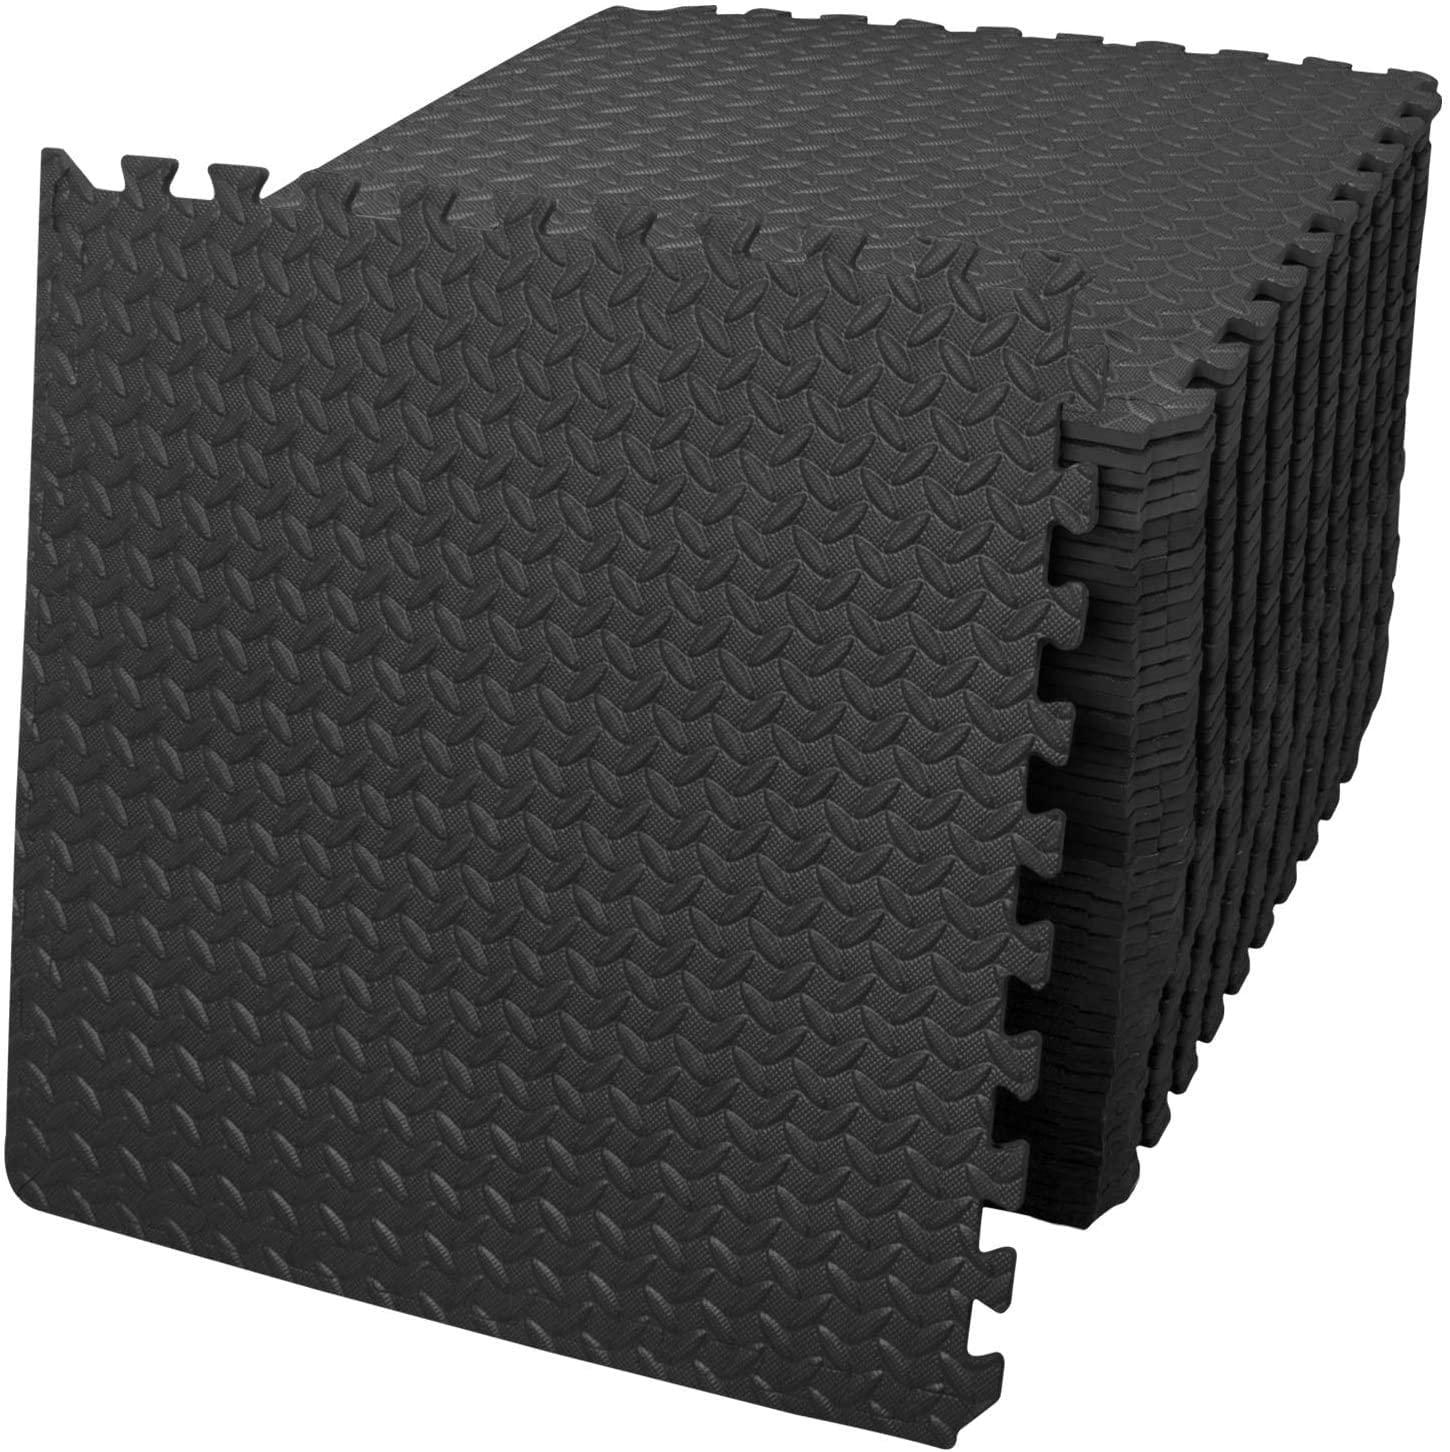 EVA floor gym mat